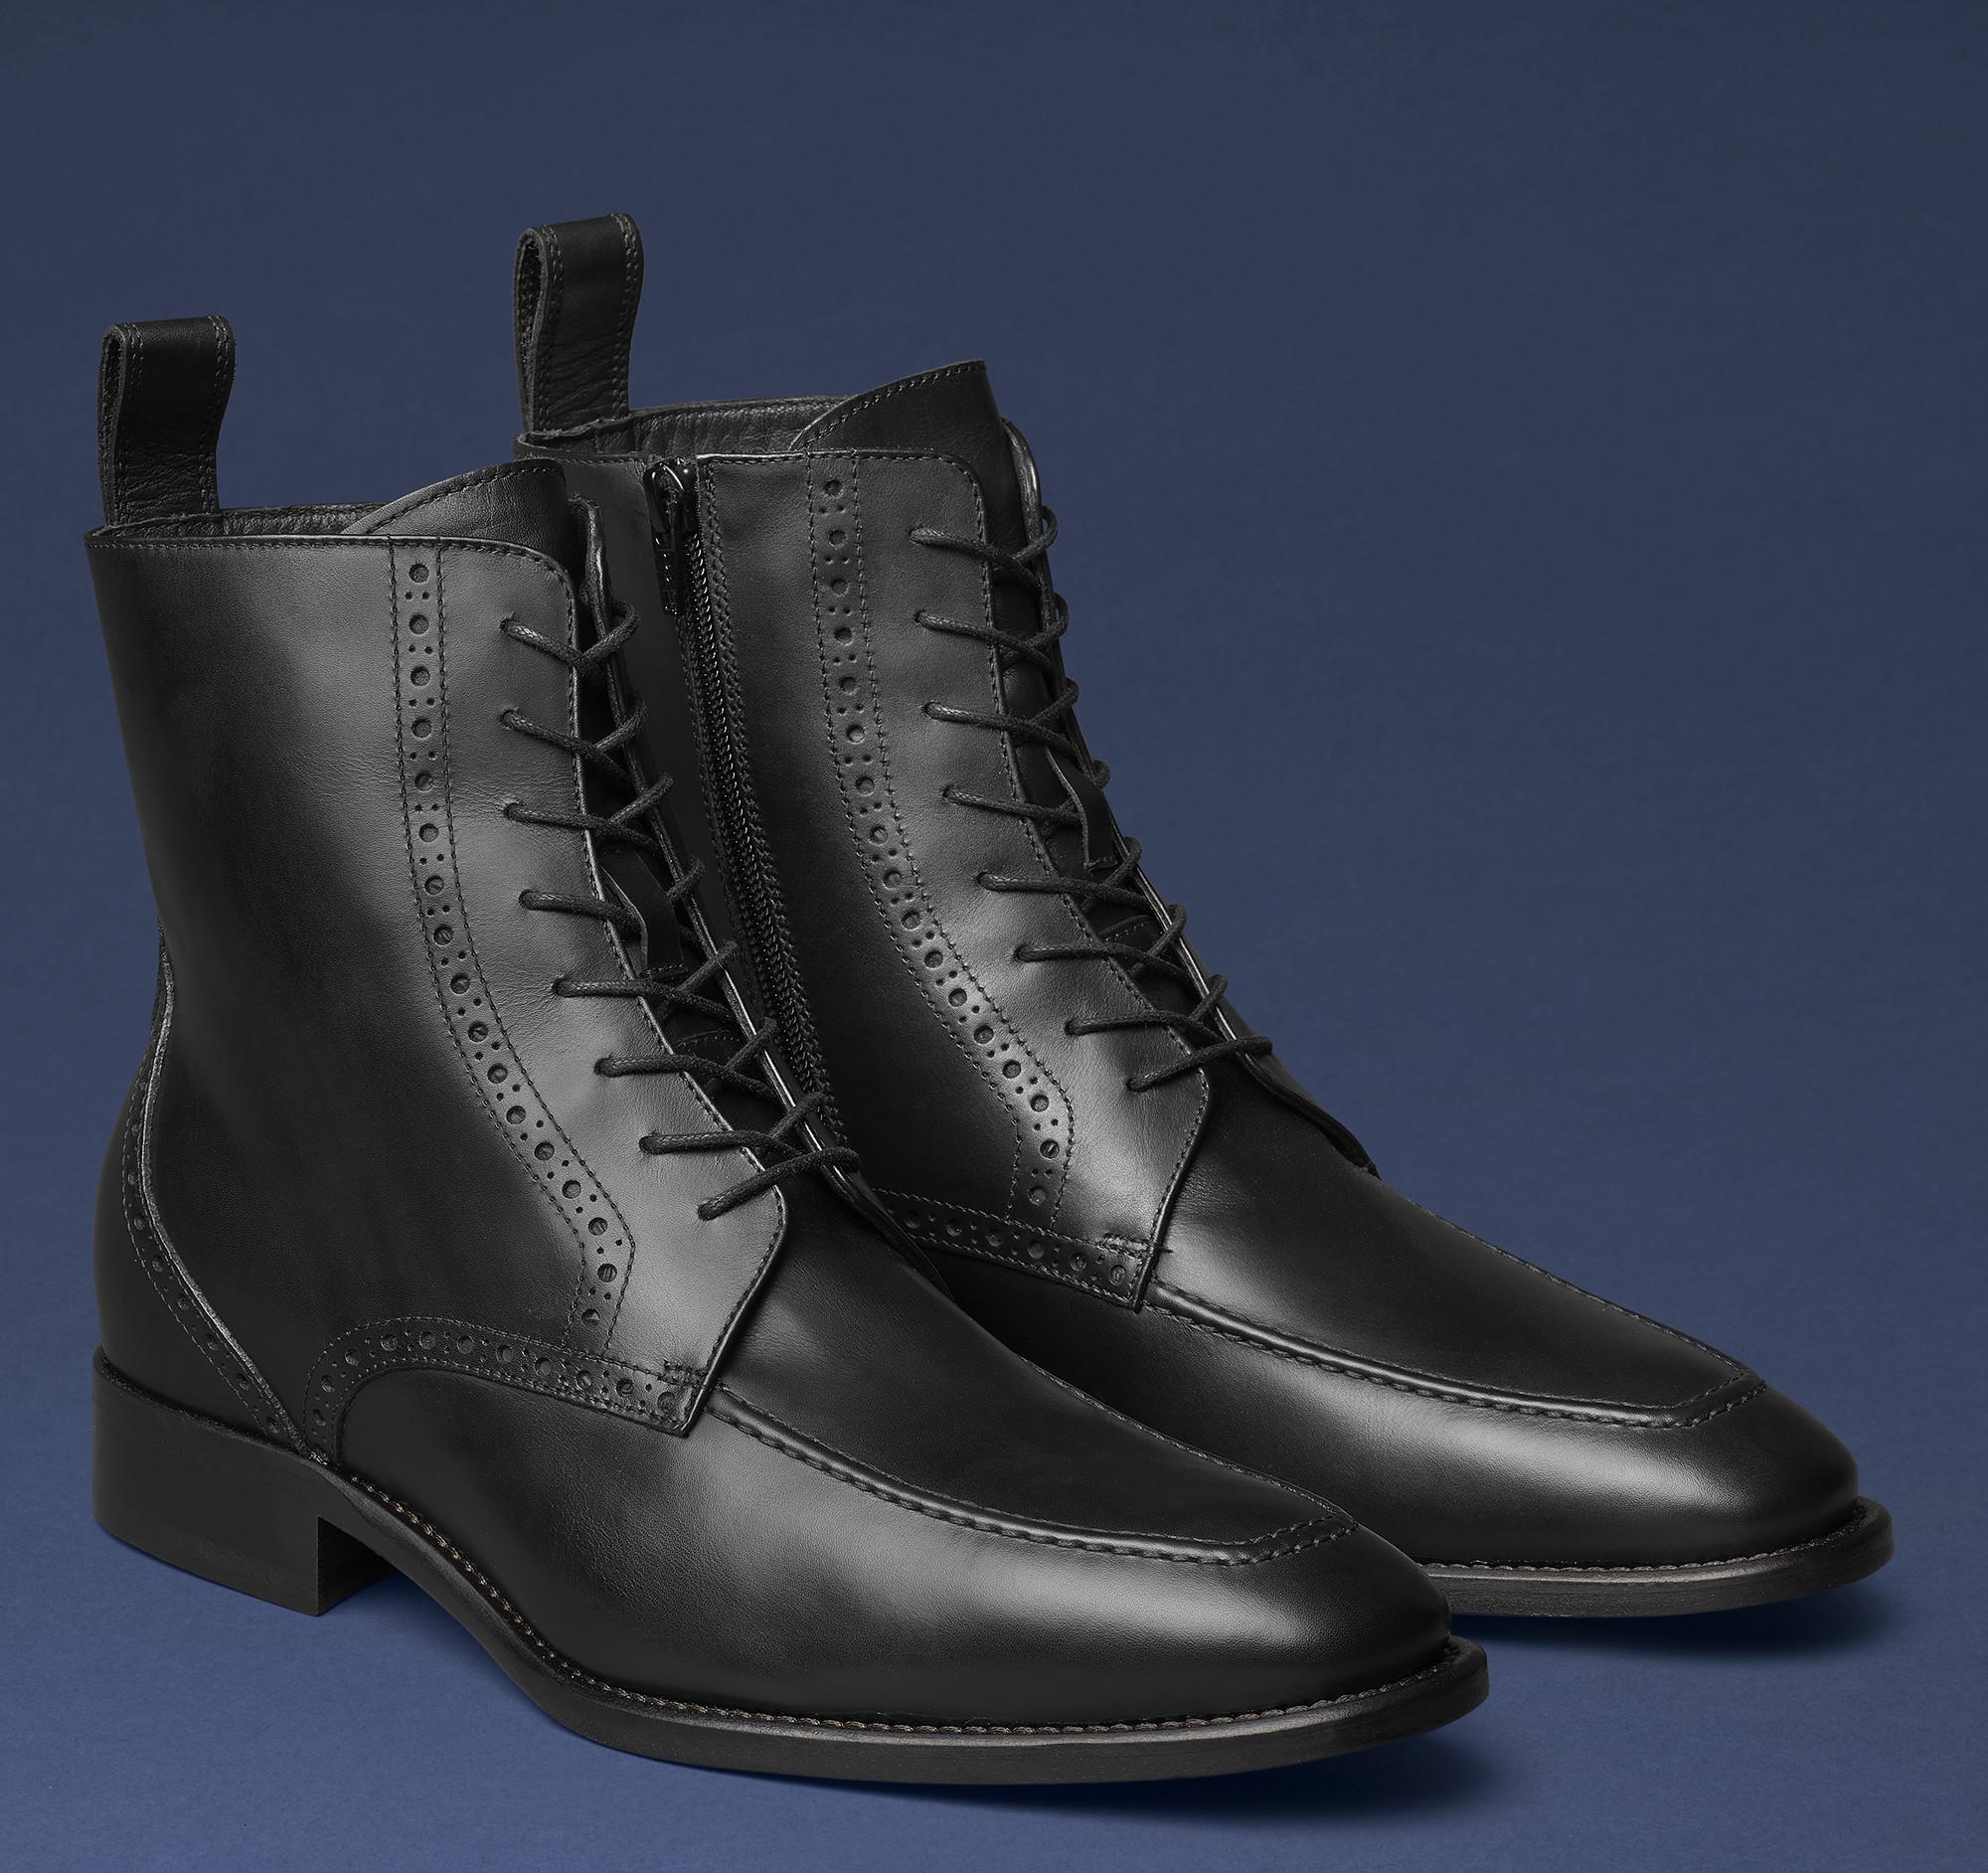 Johnston & Murphy Cormac Moc-Toe Boot